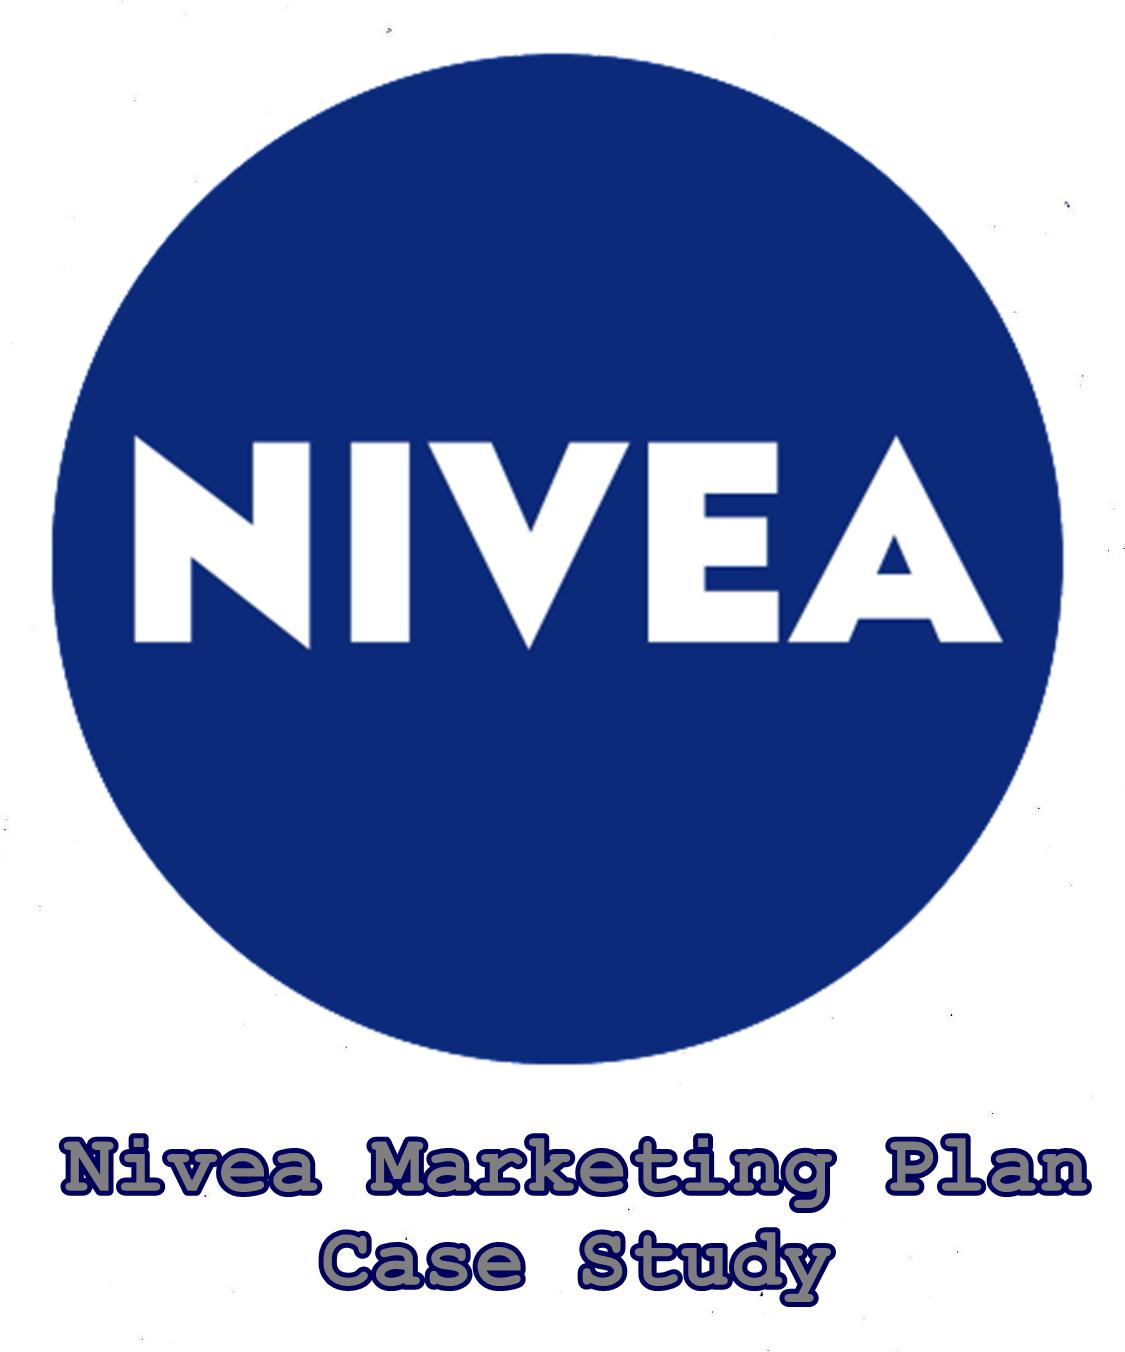 Nivea Marketing Plan Case Study Analysis